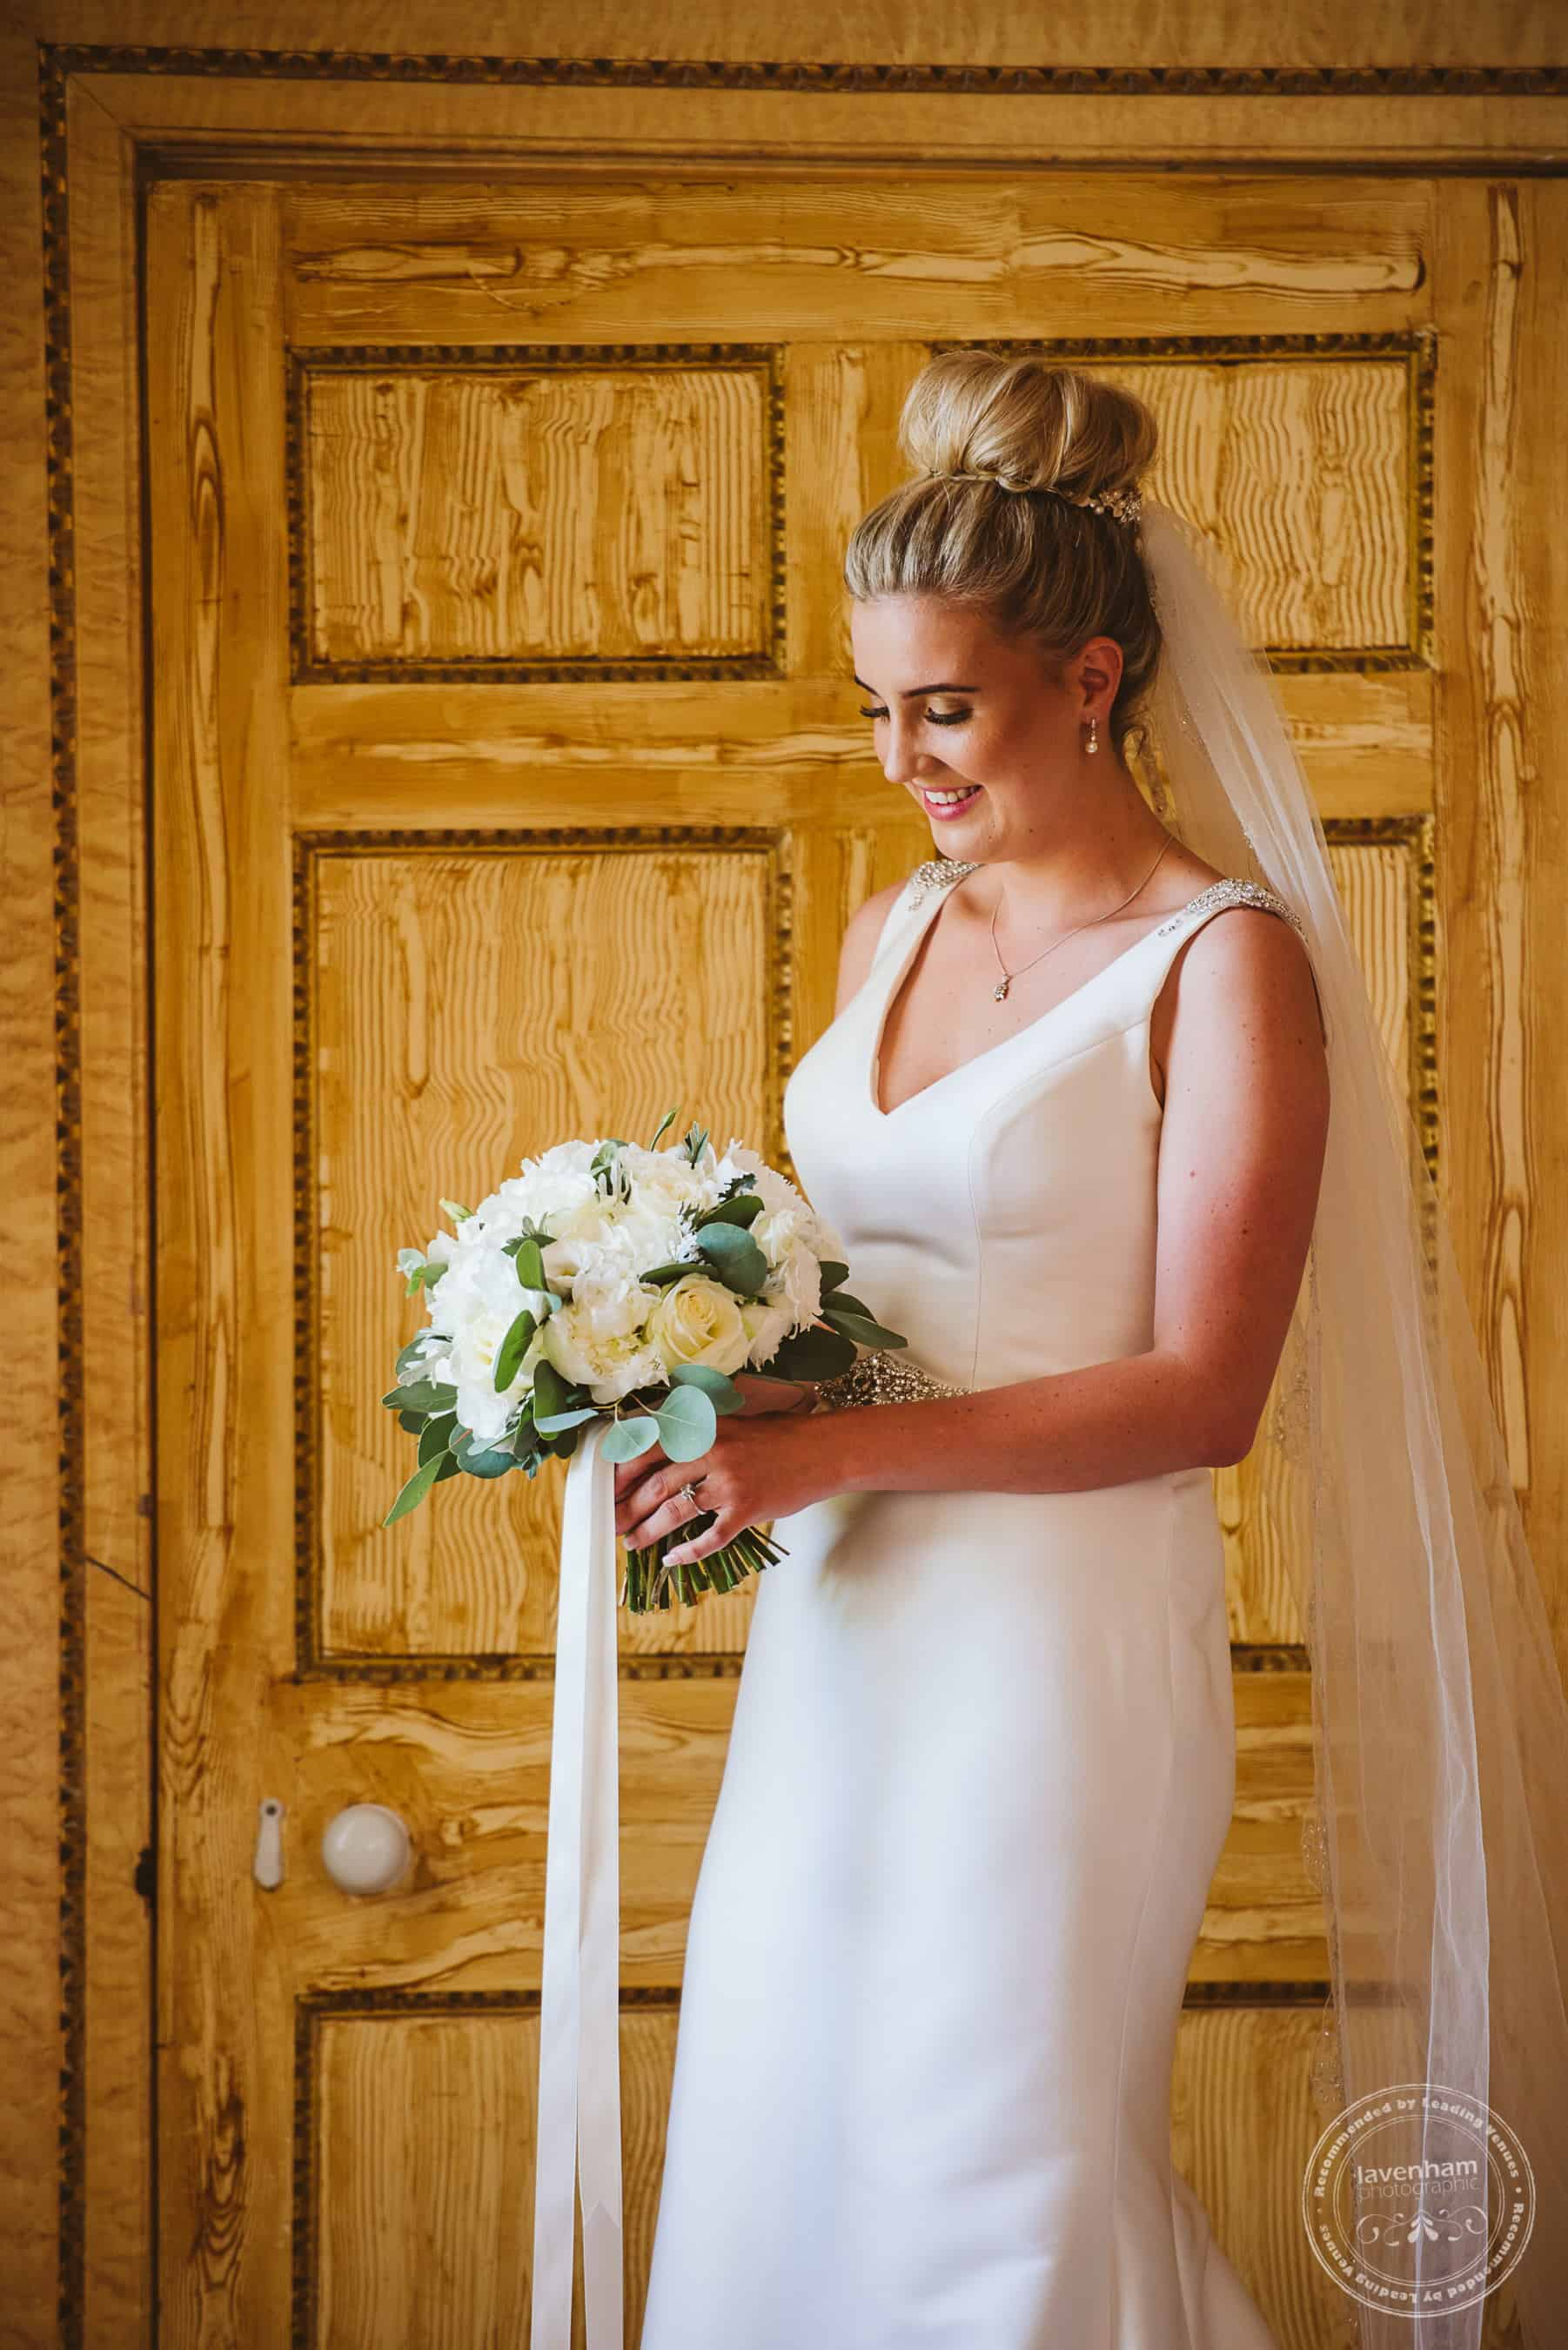 220618 Gosfield Hall Wedding Photography Lavenham Photographic 0031